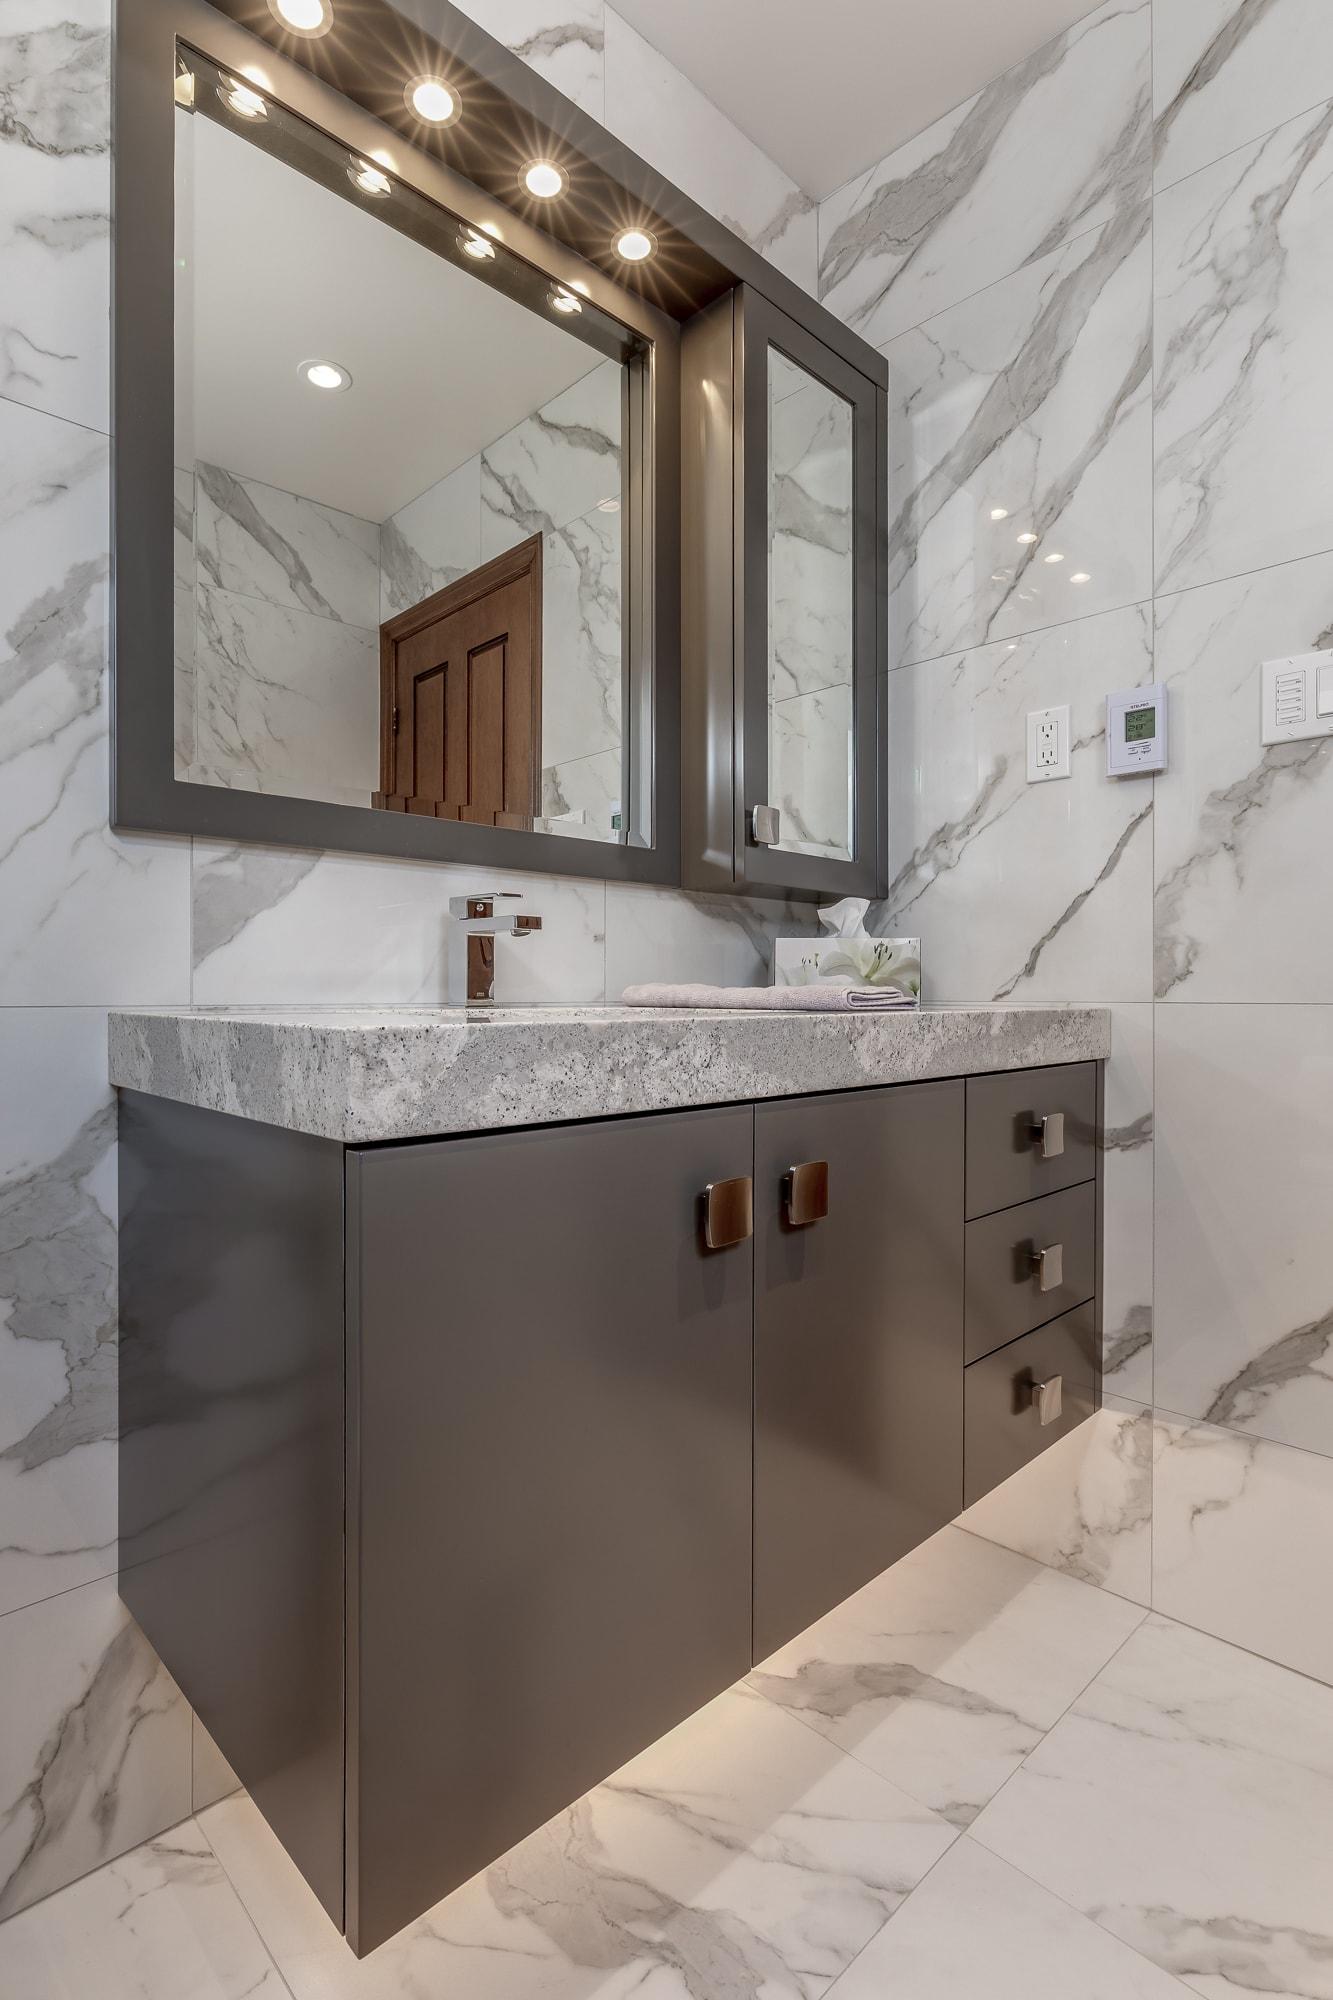 Bathroom ideas gallery